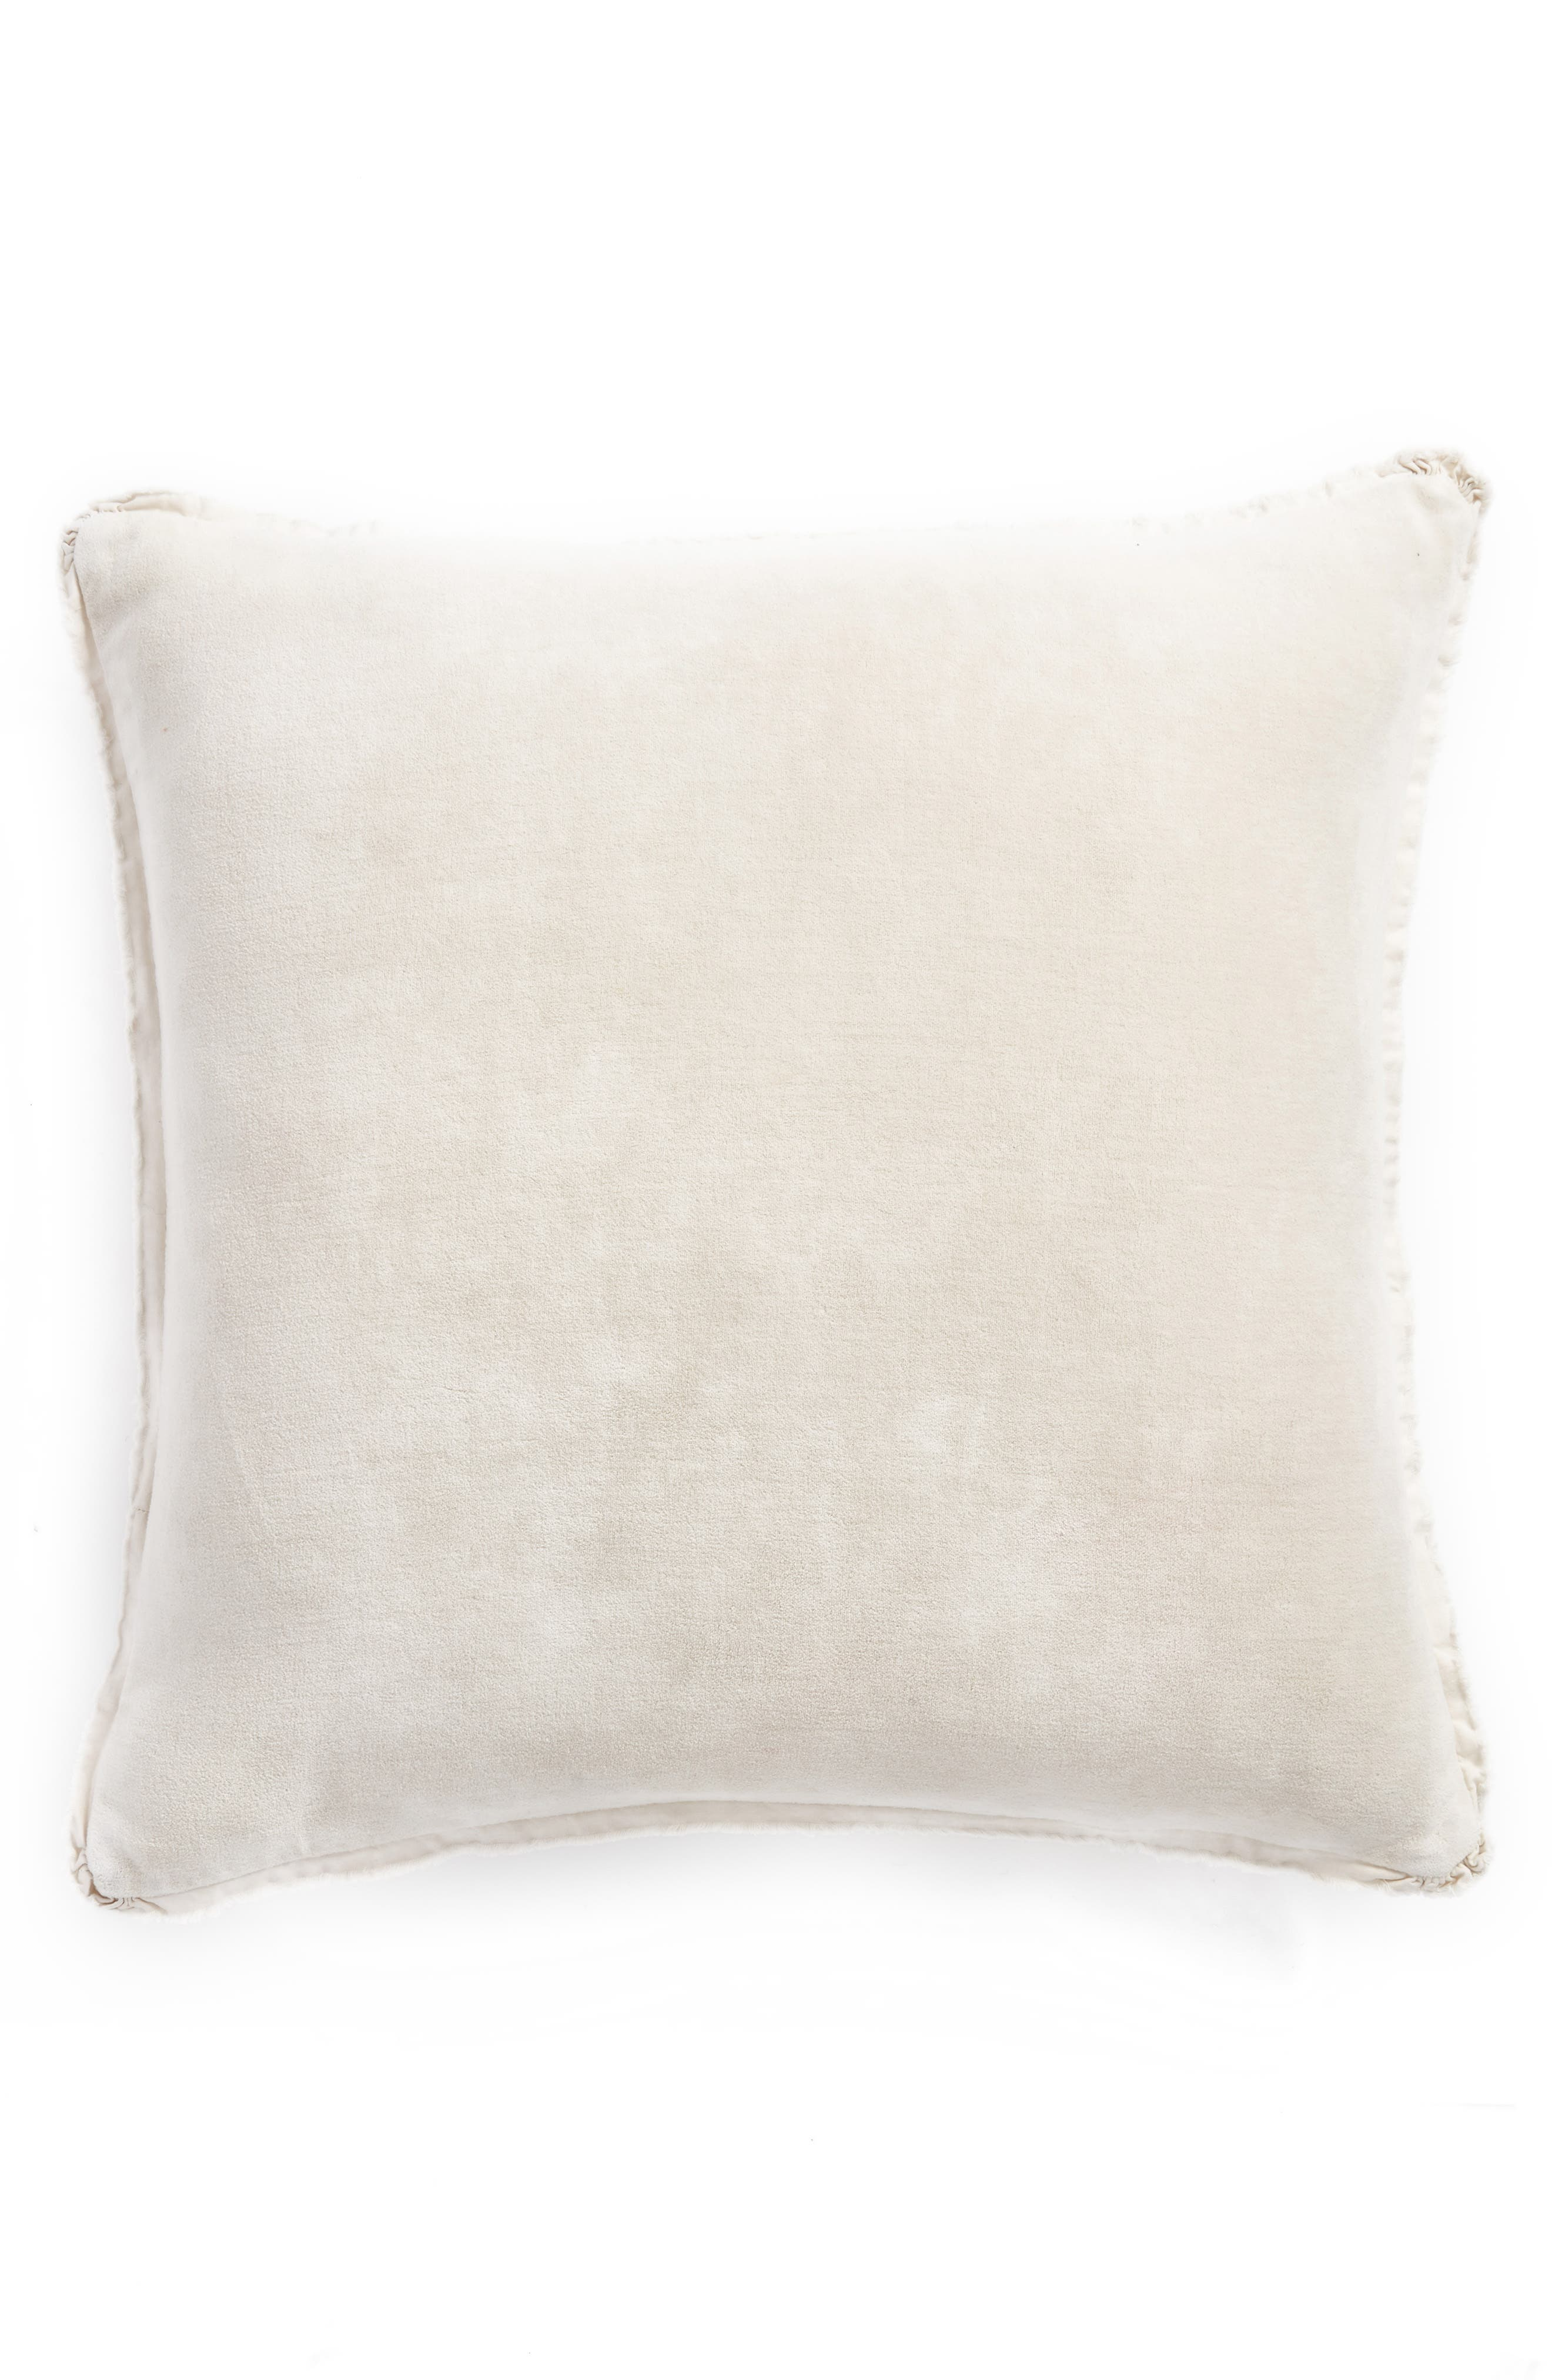 Stonewash Velvet Accent Pillow,                         Main,                         color, Grey Chime